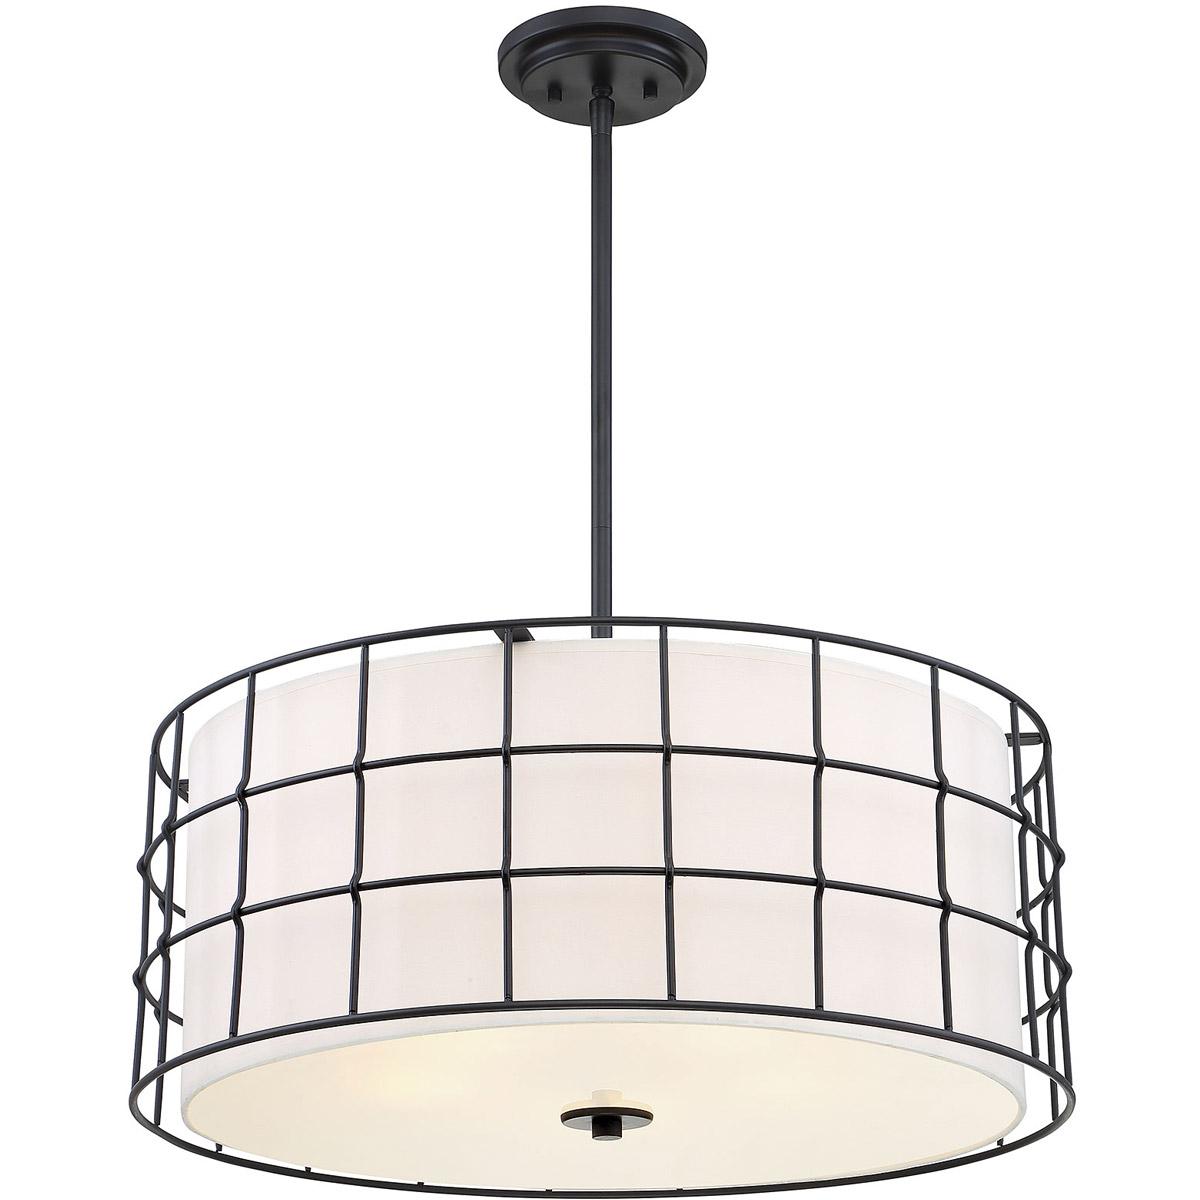 Current Details About Savoy House Lighting 7 8501 5 89 Hayden Pendant Black Regarding Hayden 5 Light Shaded Chandeliers (View 2 of 20)